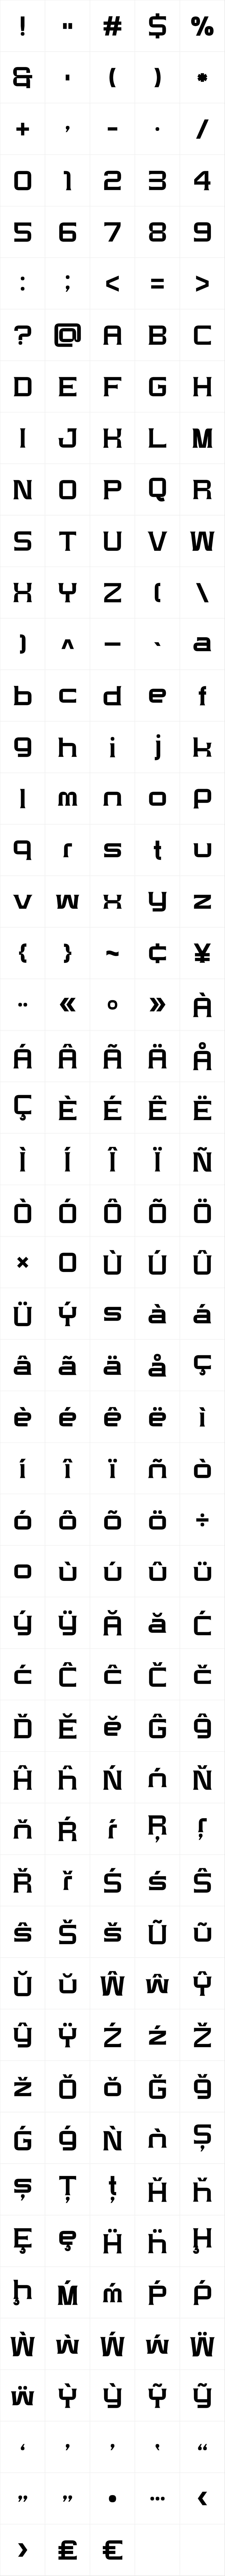 Modernhead Serife Bold